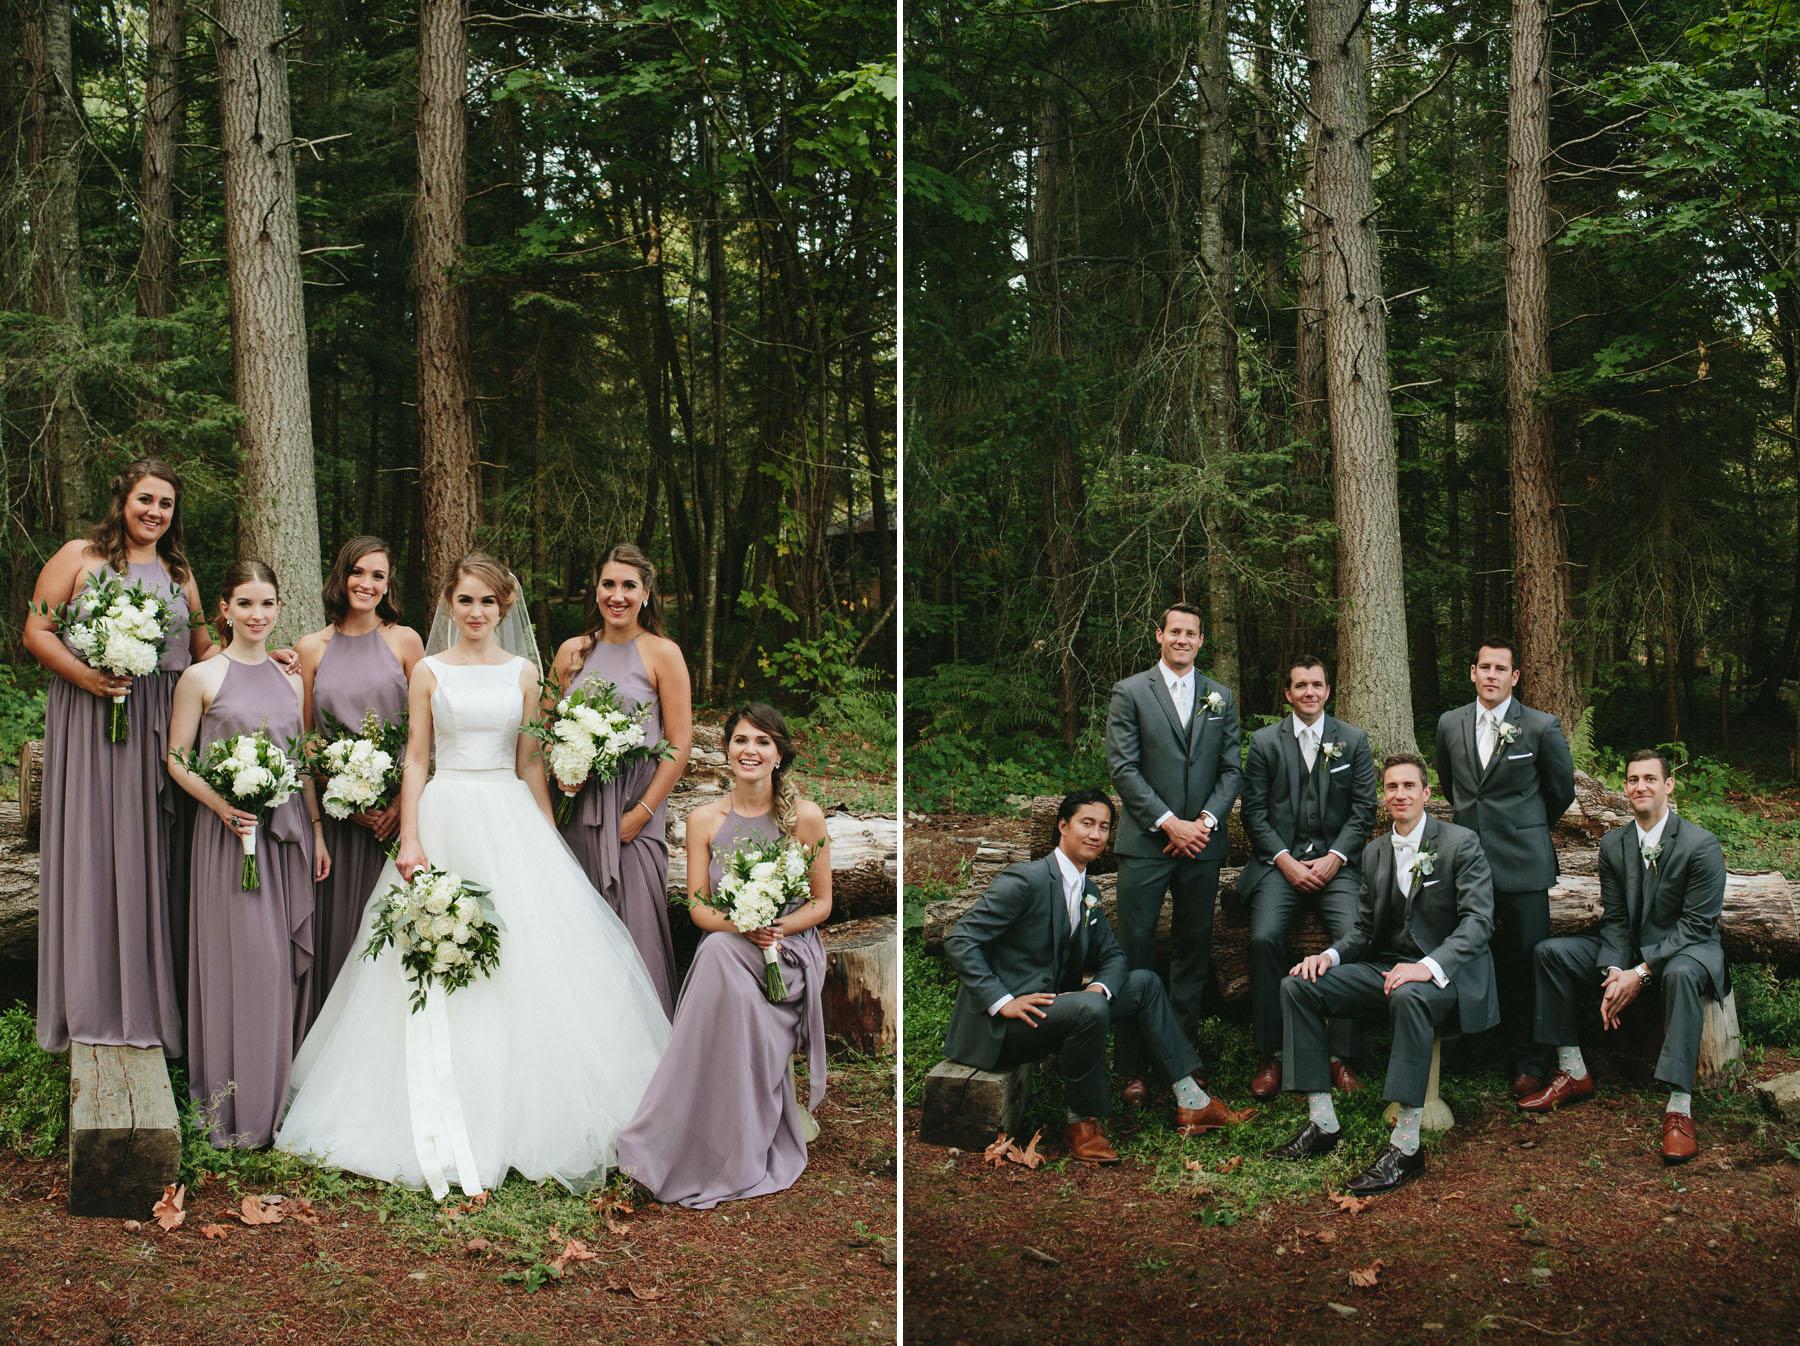 thetis-island-wedding-photographer-rp-rn-107.jpg